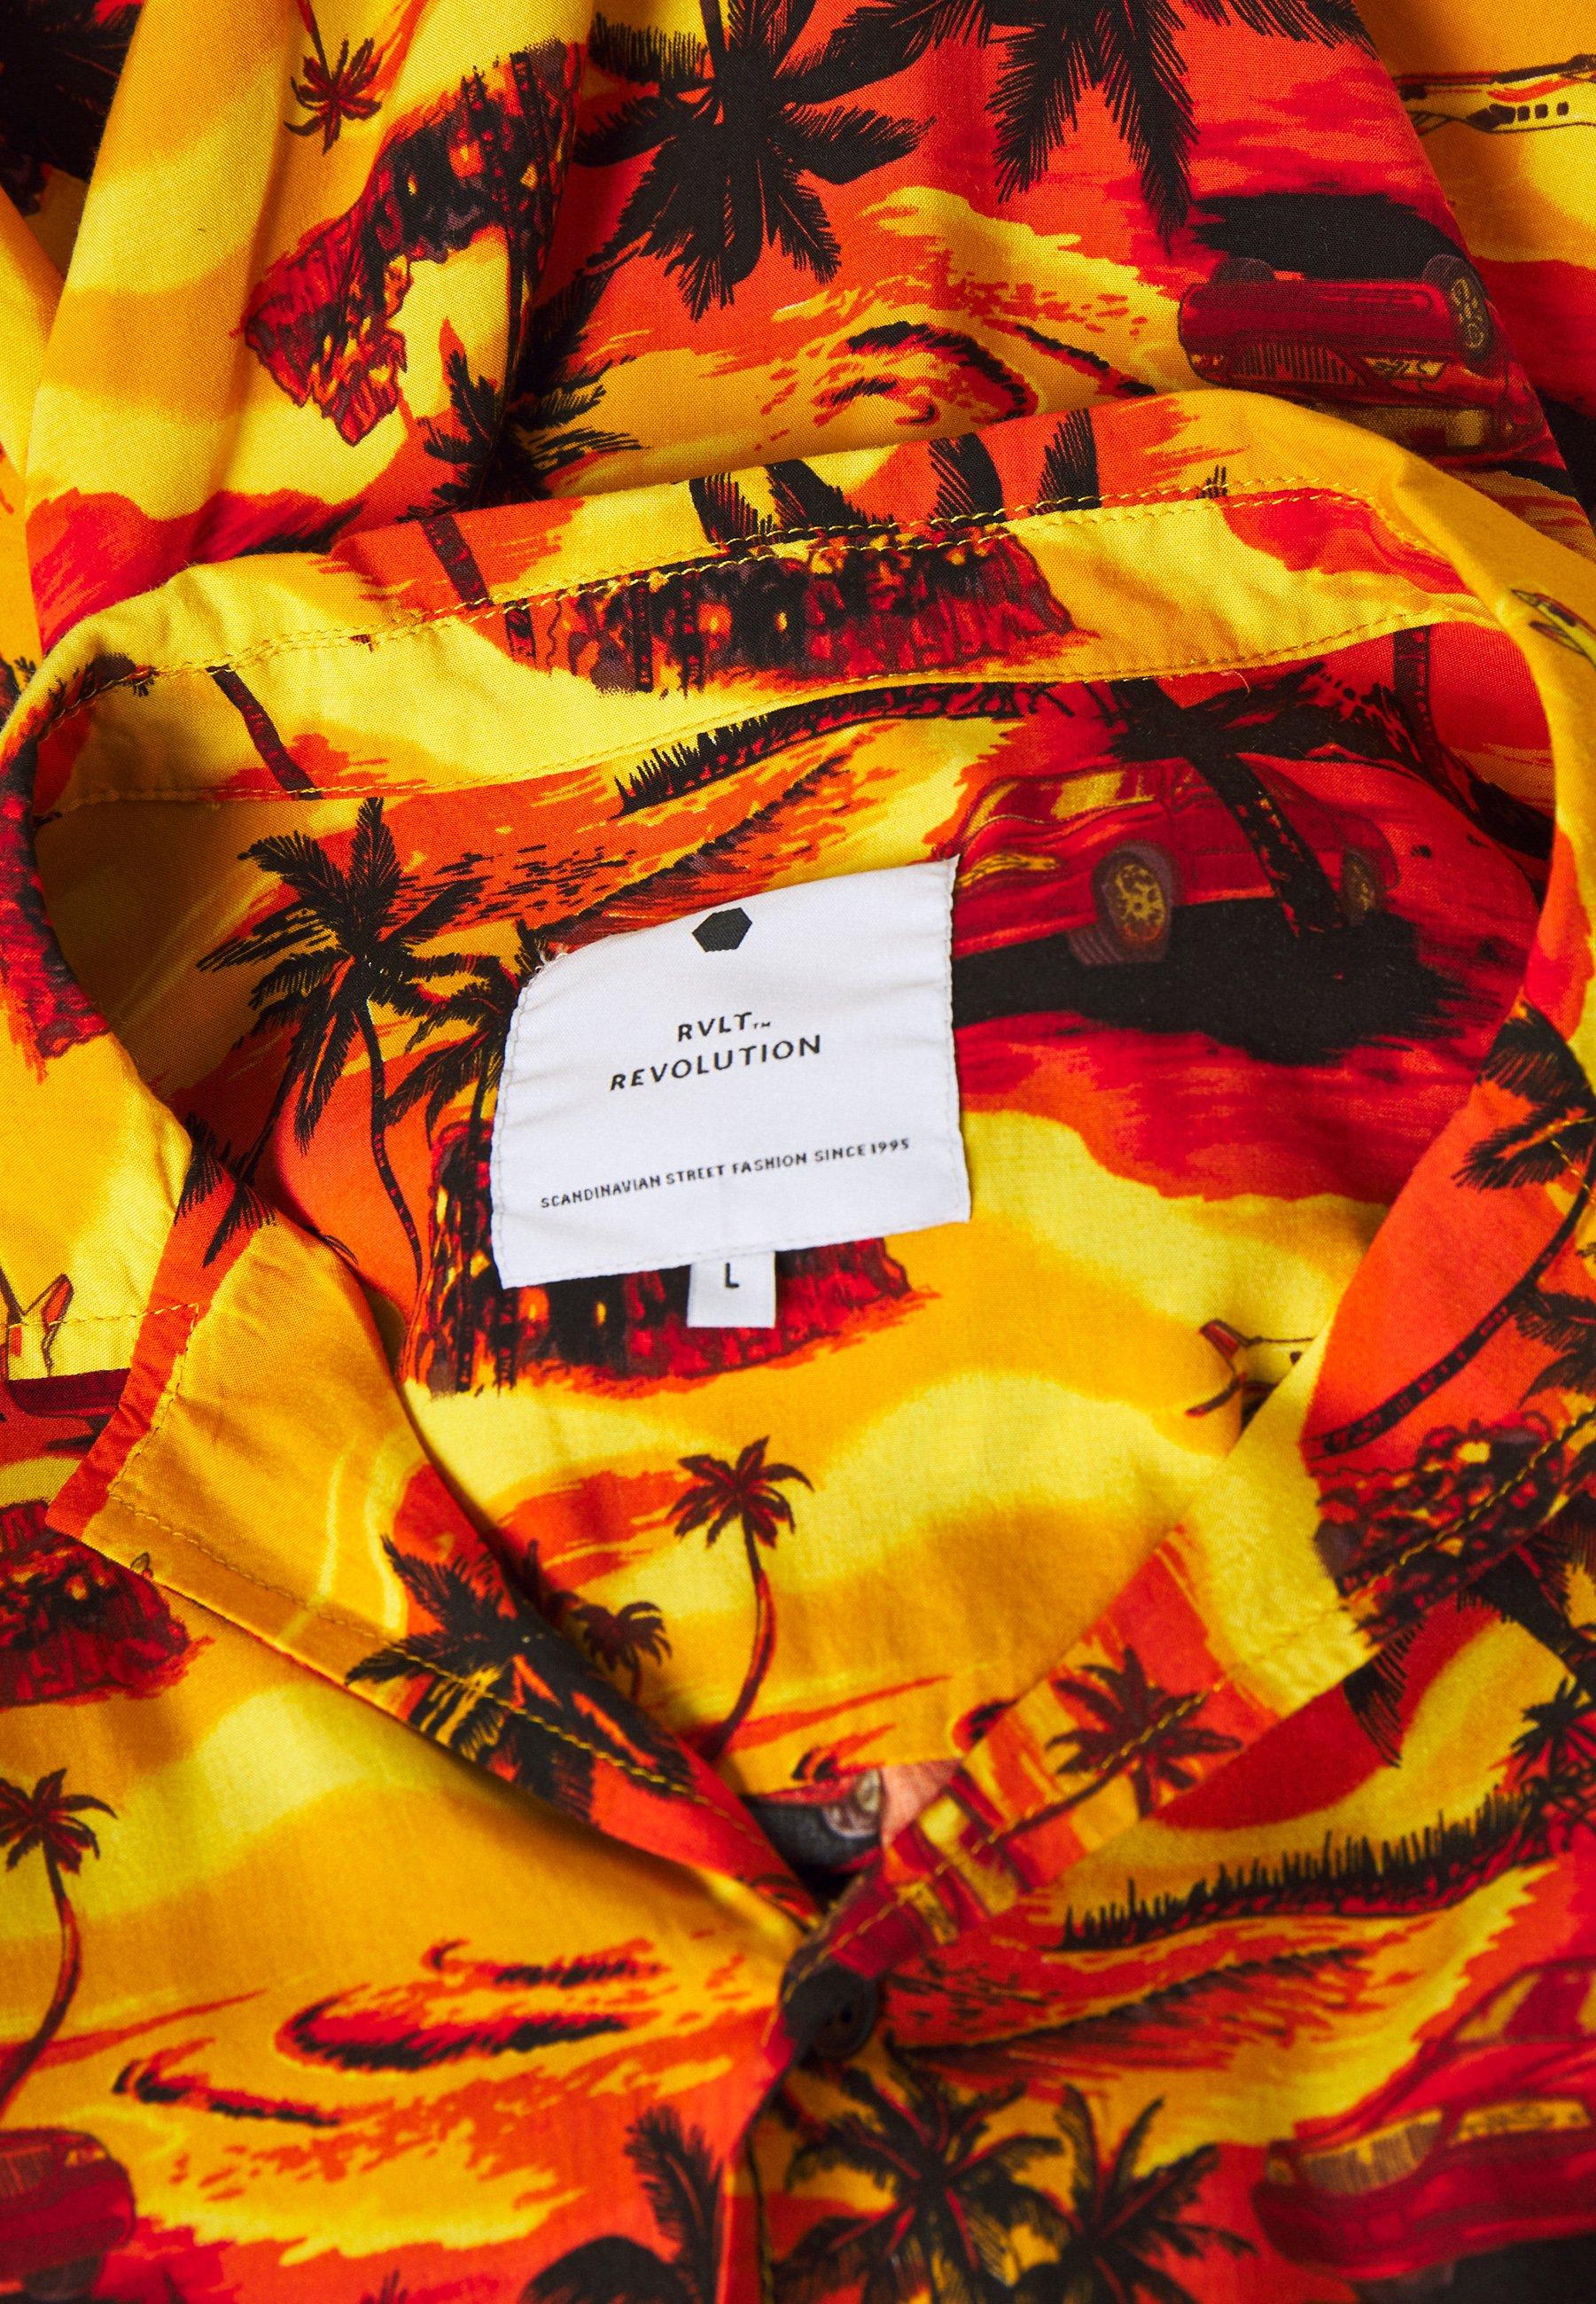 RVLT Skjorta - yellow - Herrkläder Rabatter